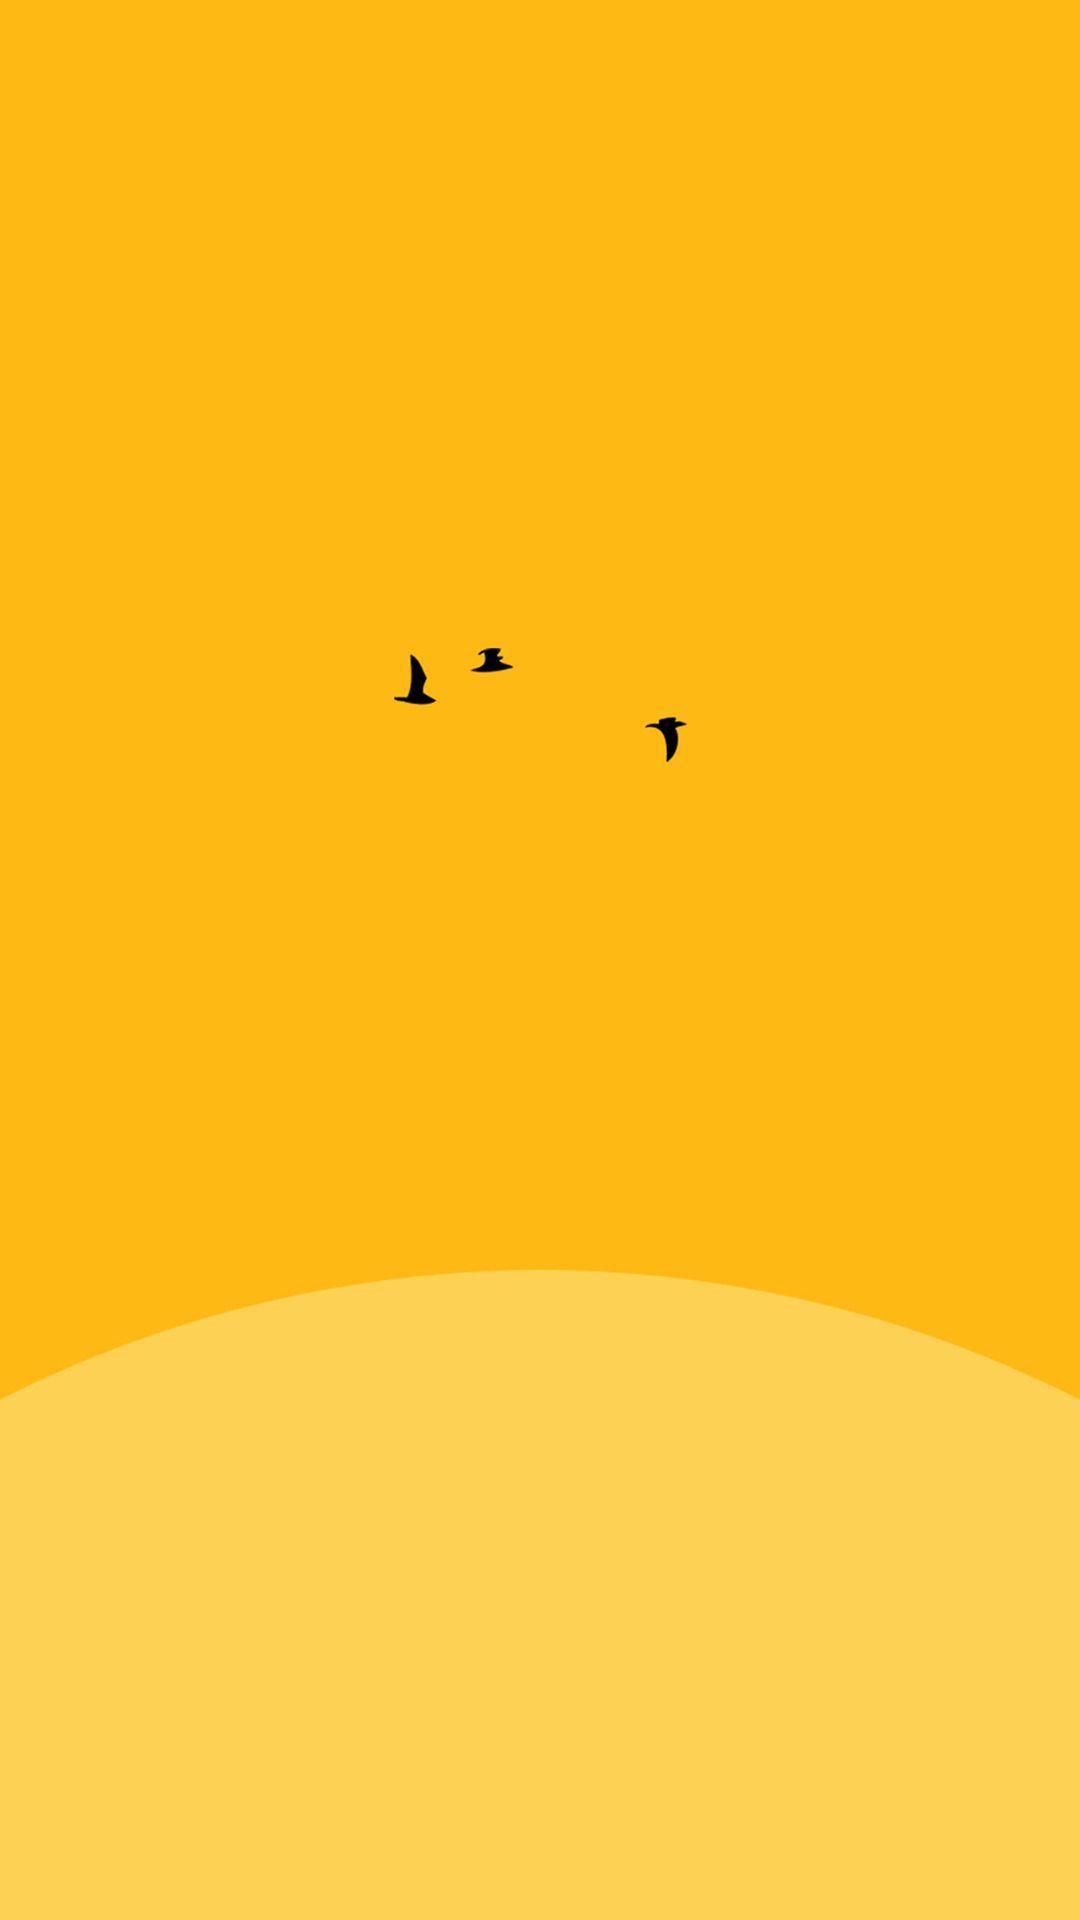 sunsetyellowbirdminimaliphone6pluswallpaper in 2019